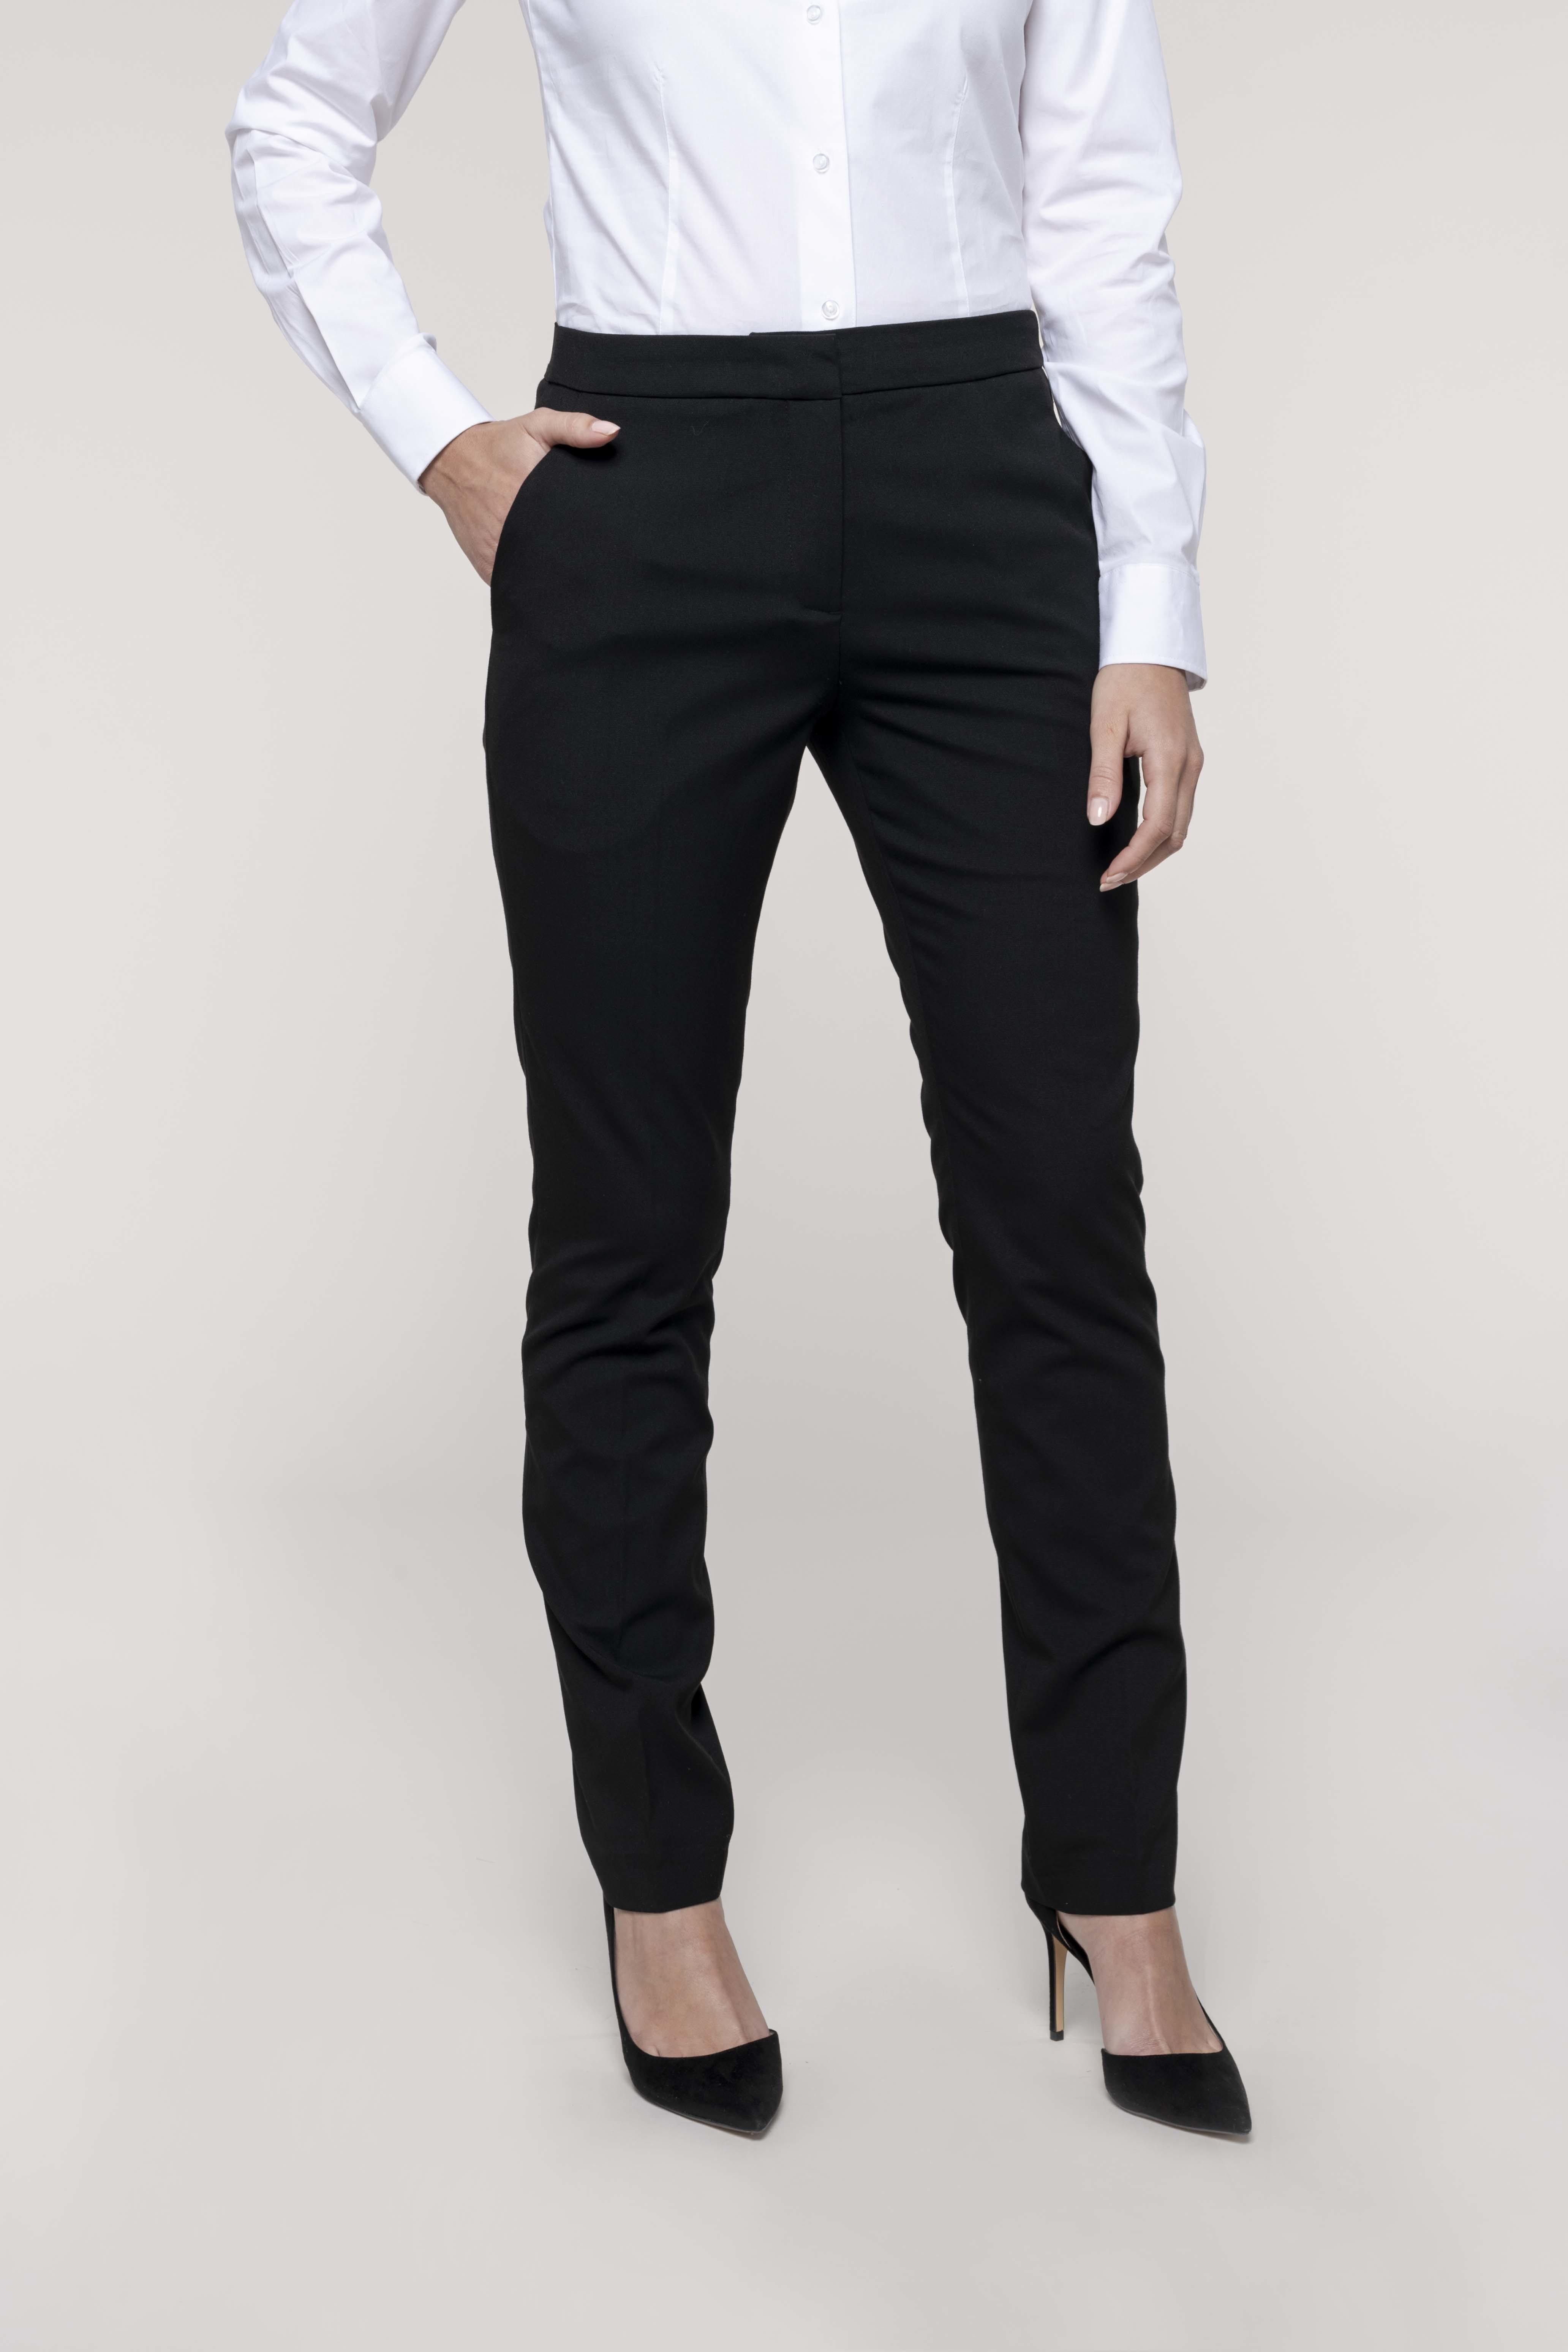 Pantalon femme - 2-1493-9